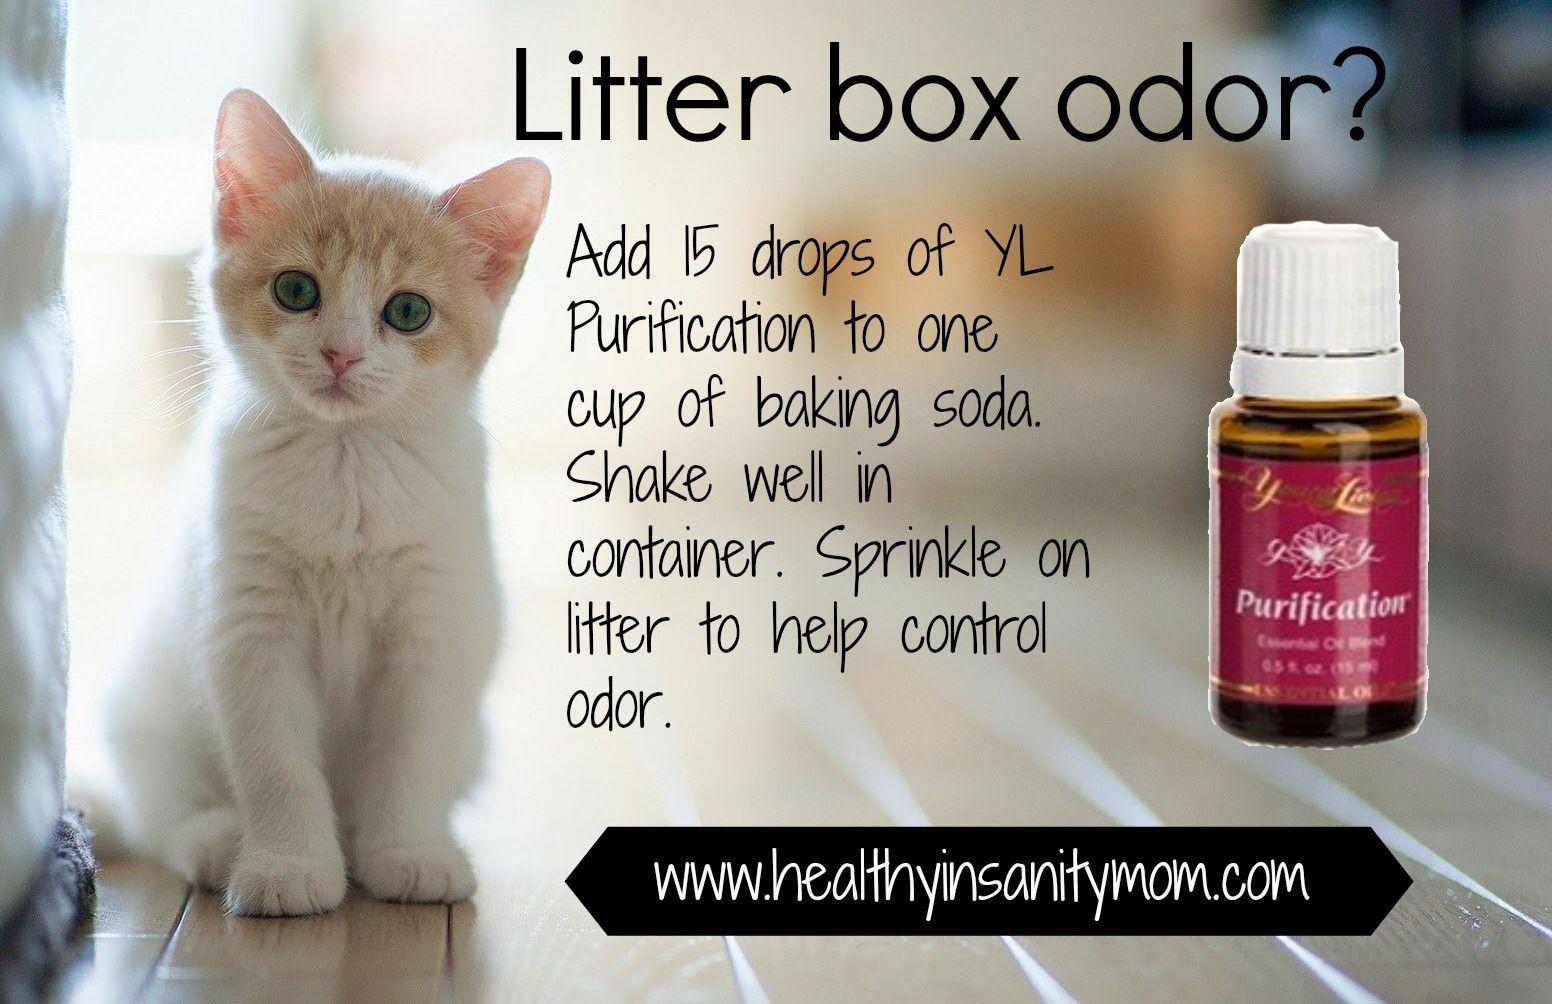 essential oils for cat litter odor essentialoilrecipes essentialoils healthyinsanitymom. Black Bedroom Furniture Sets. Home Design Ideas